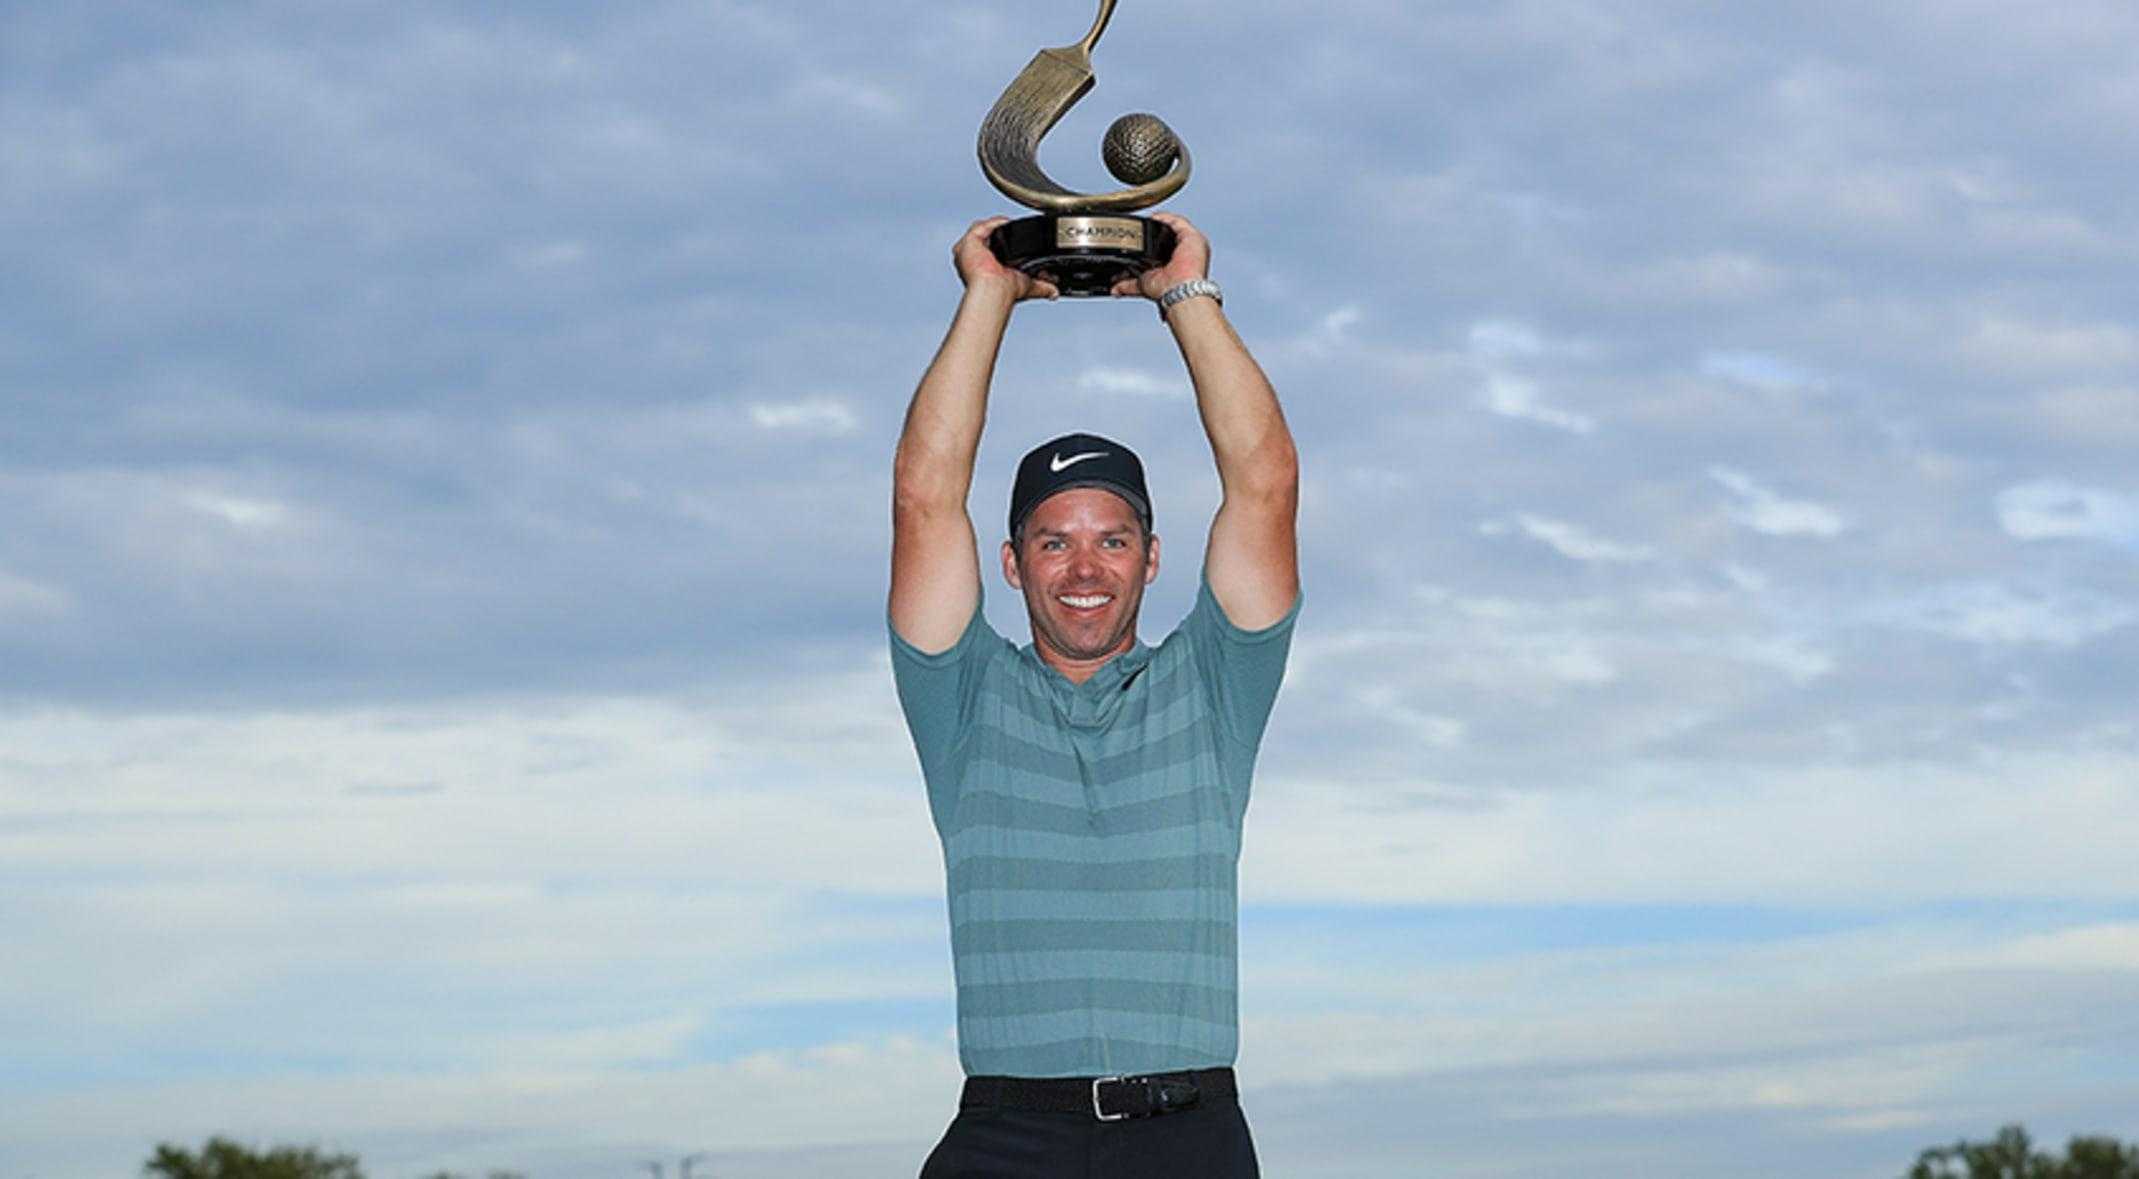 c2df715a9da32 Paul Casey captures first PGA TOUR win since 2009 at Valspar